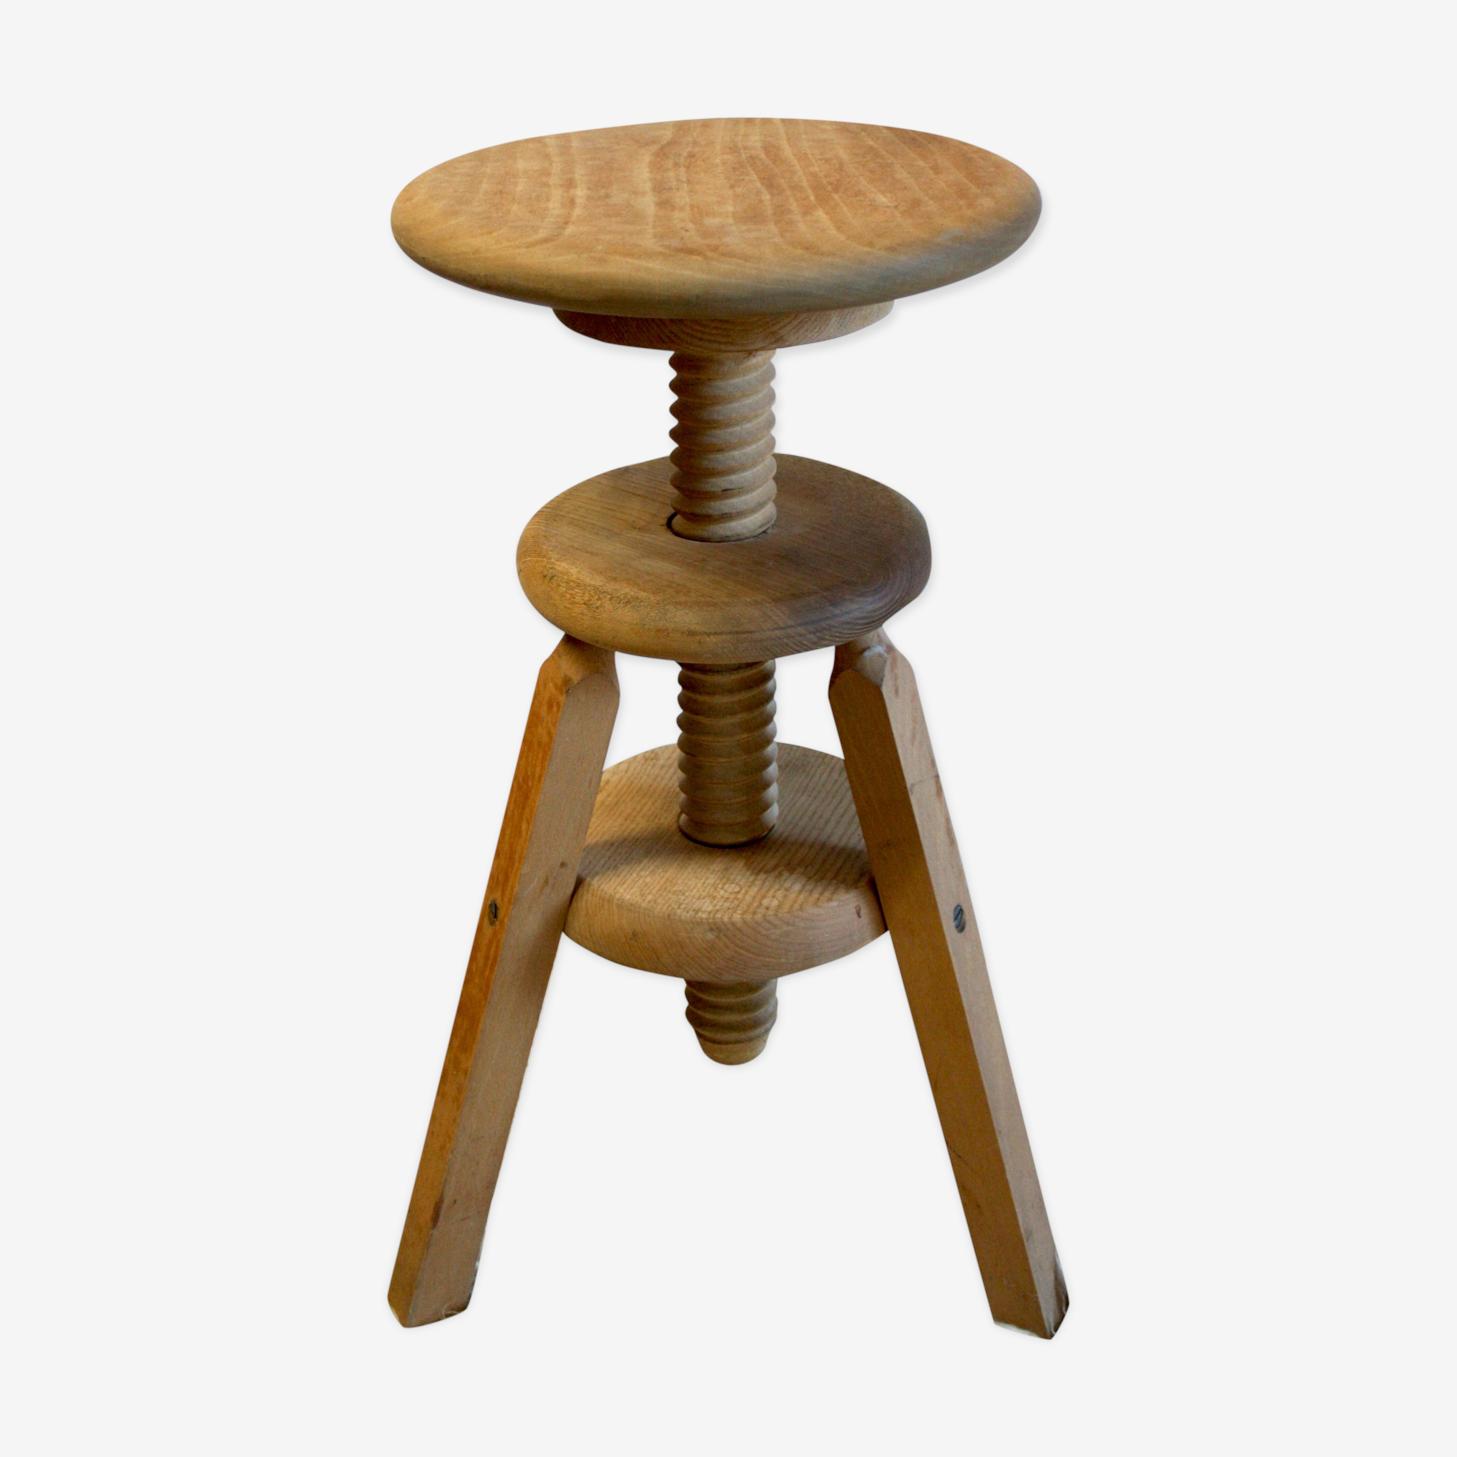 Artist stool, 70's